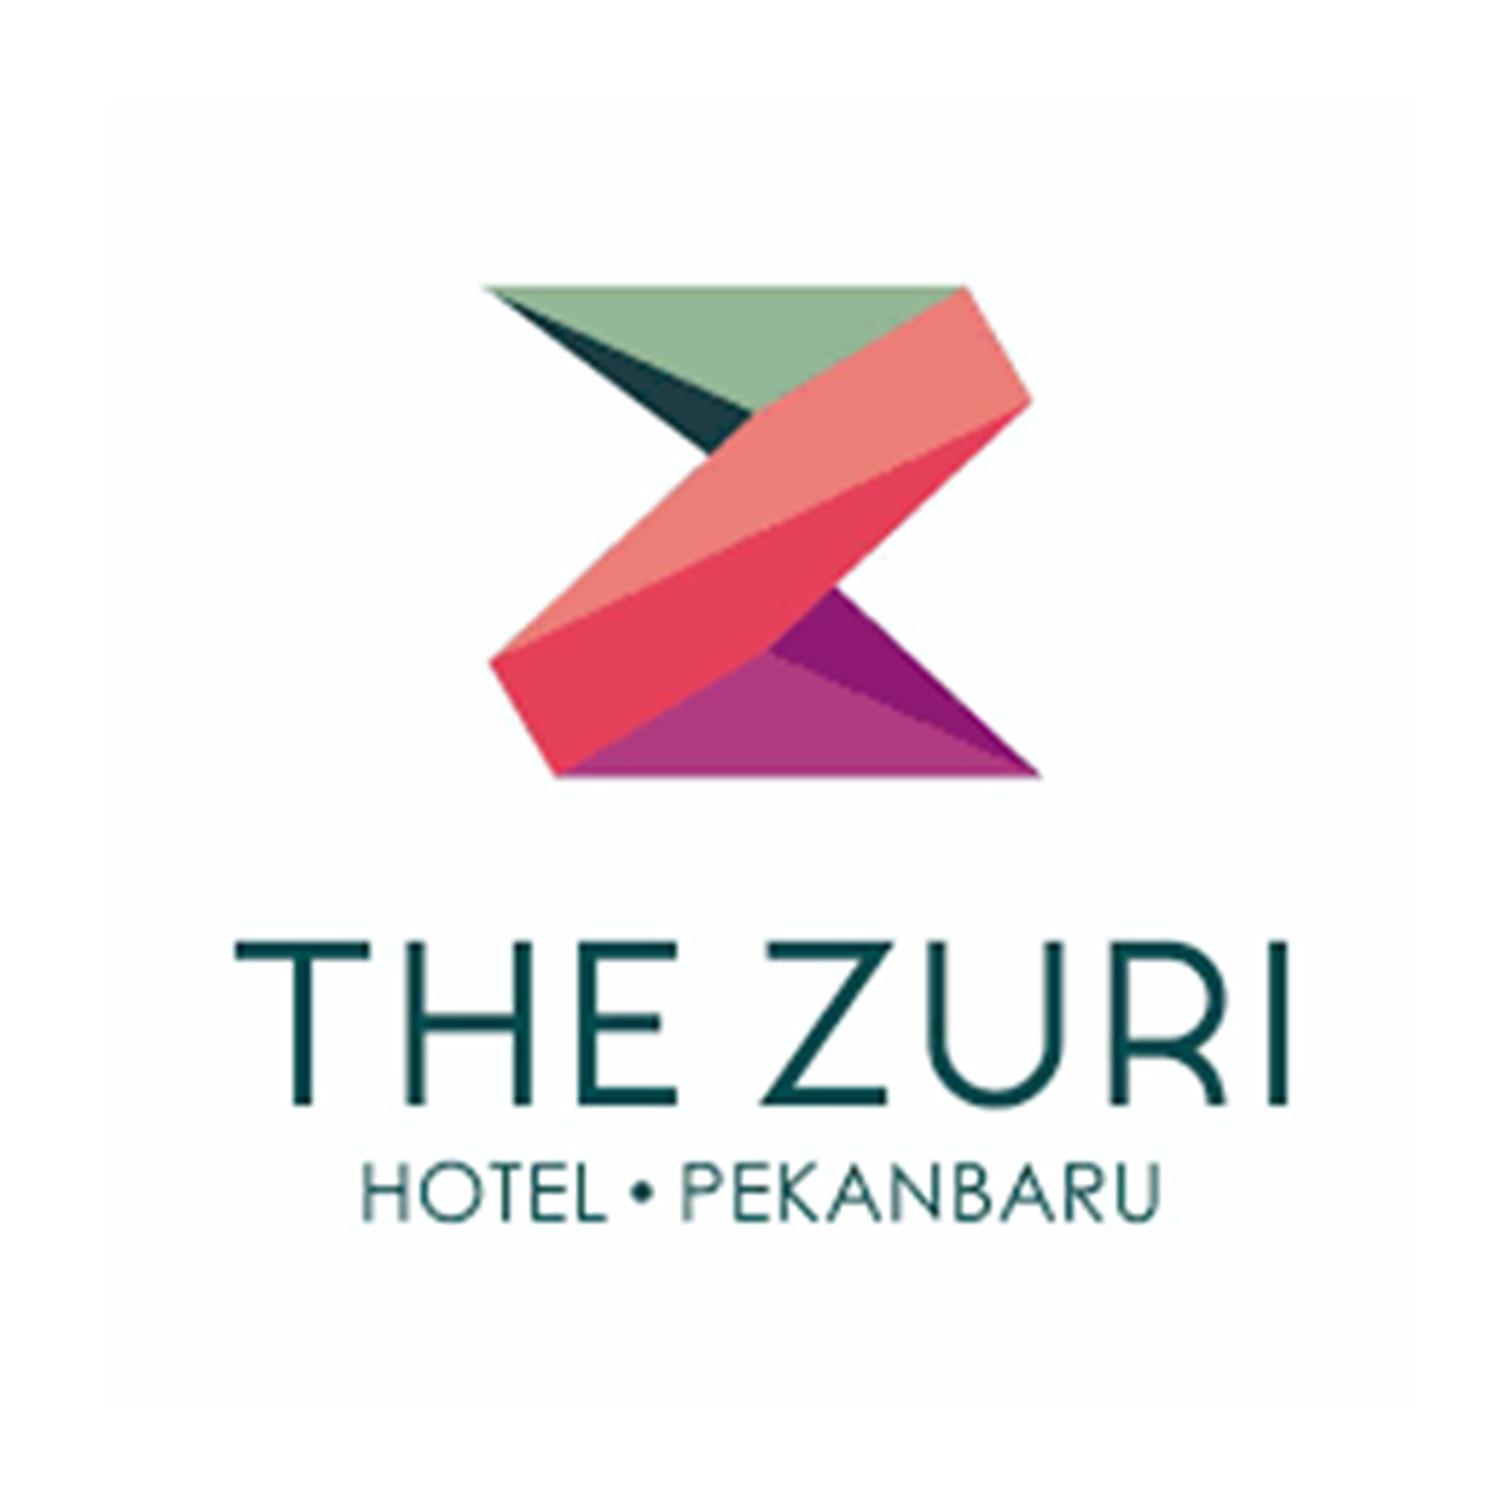 lowongan-kerja-zuri-hotel-pekanbaru